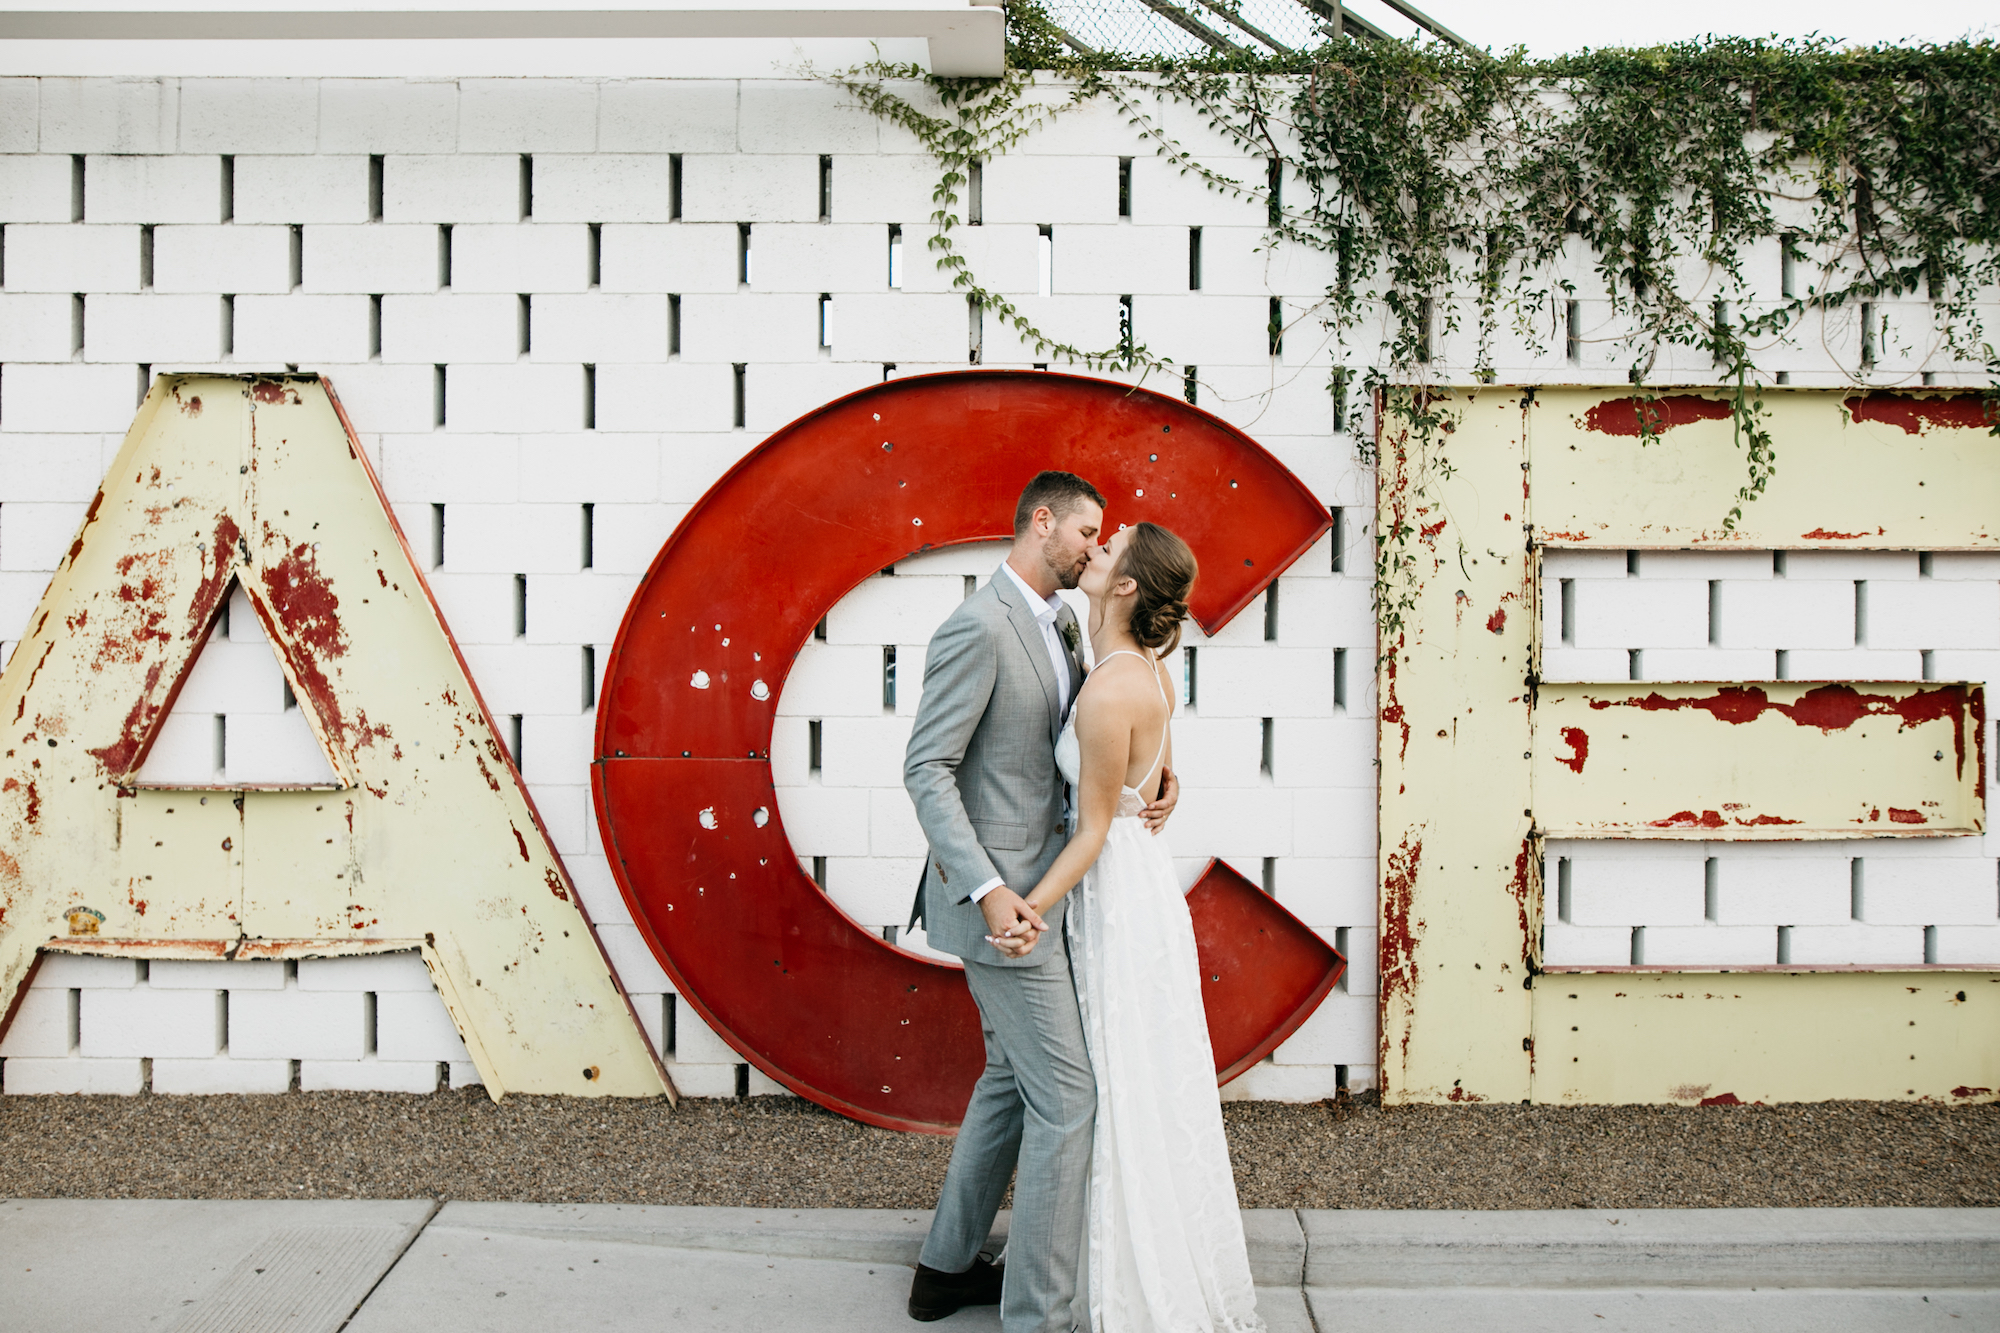 ace-hotel-palm-springs-wedding-photographer639.jpg